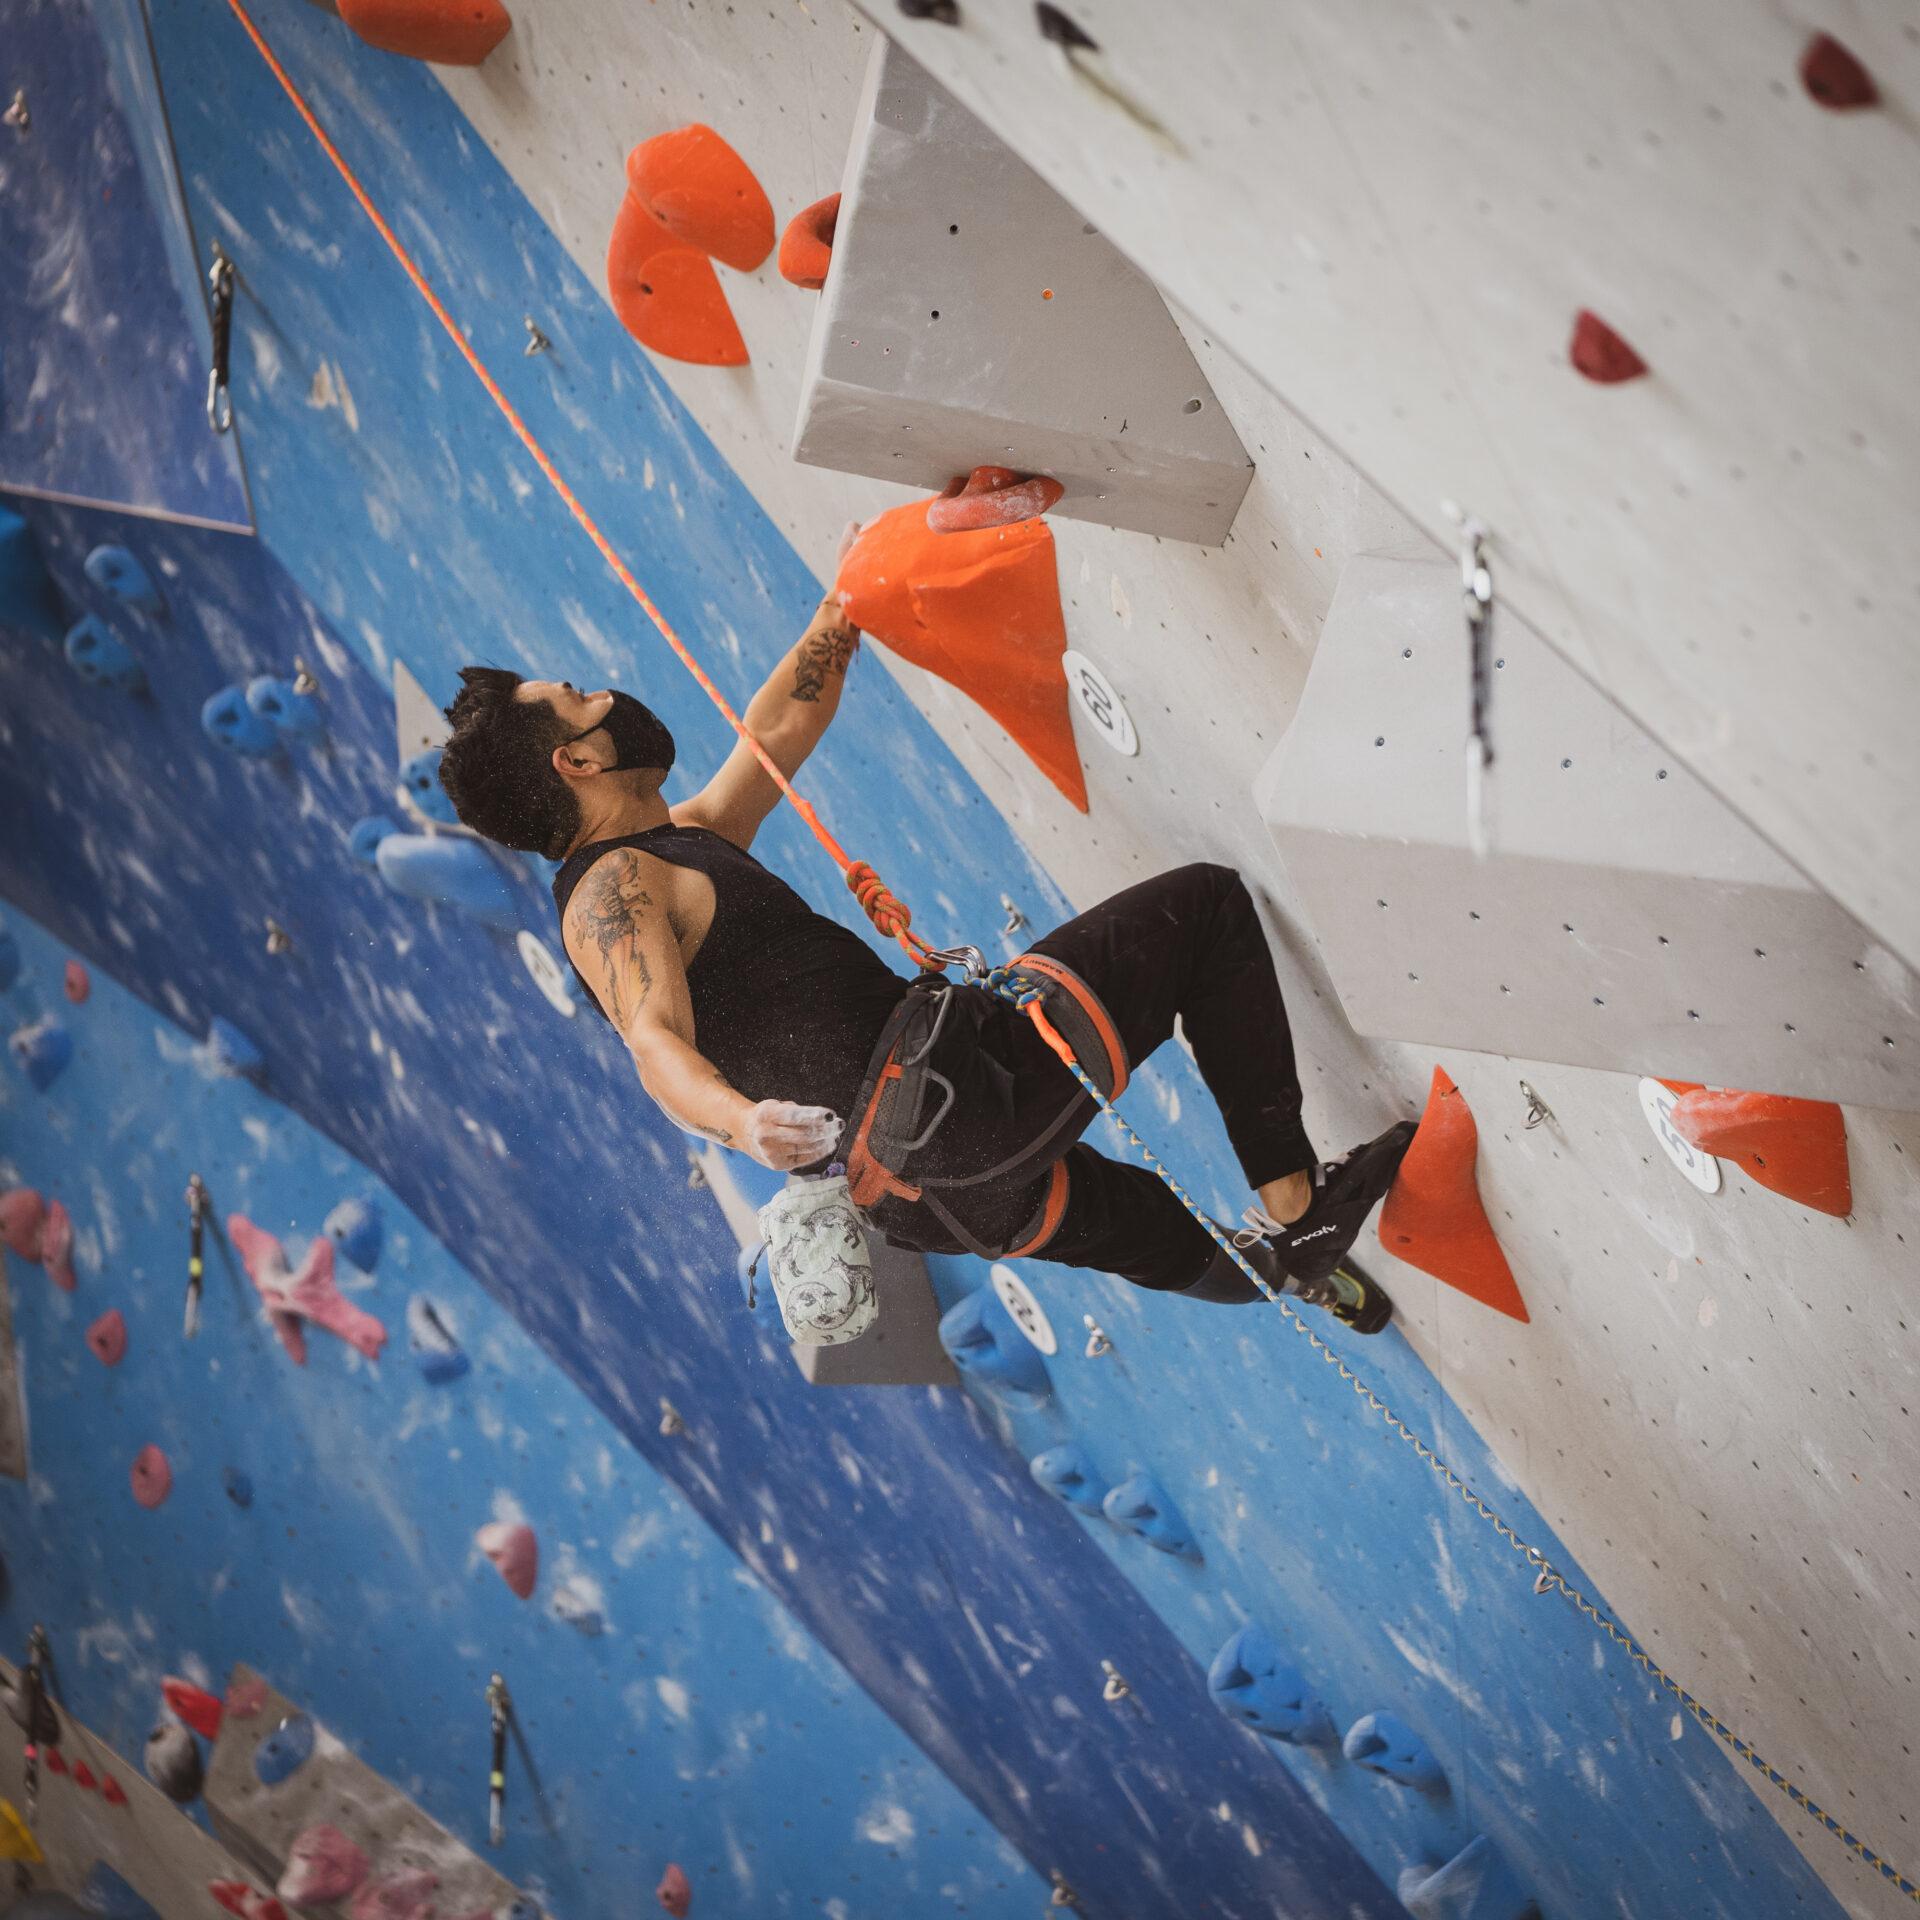 Jake Sanchez, US Paraclimbing National Team, climbs high on a lead wall.